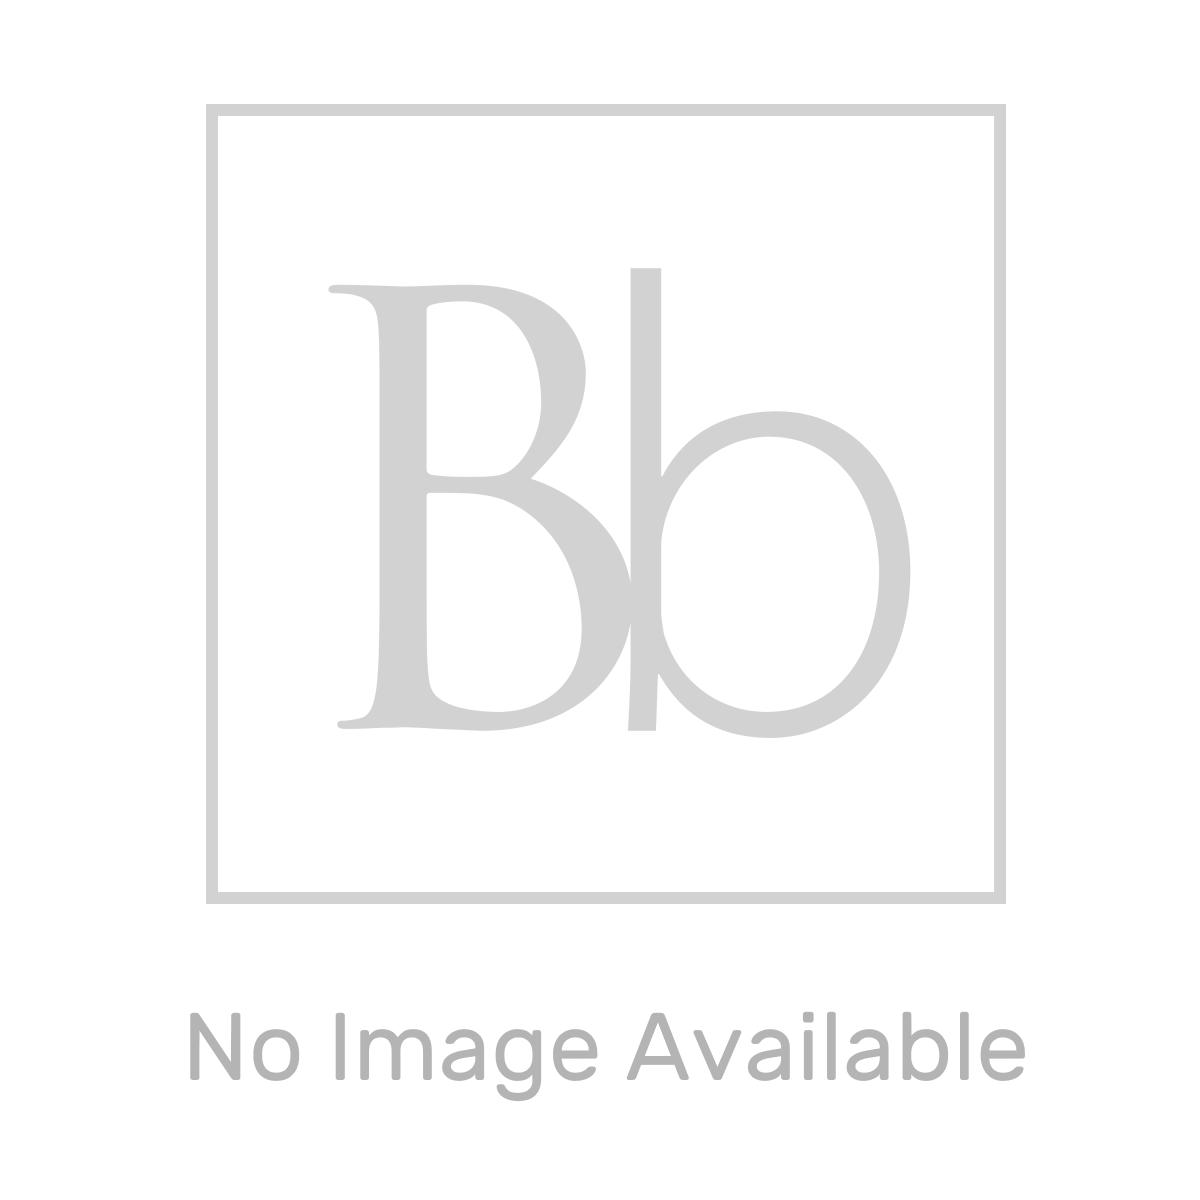 RAK Surface Charcoal Tile 600 x 600mm Lifestyle